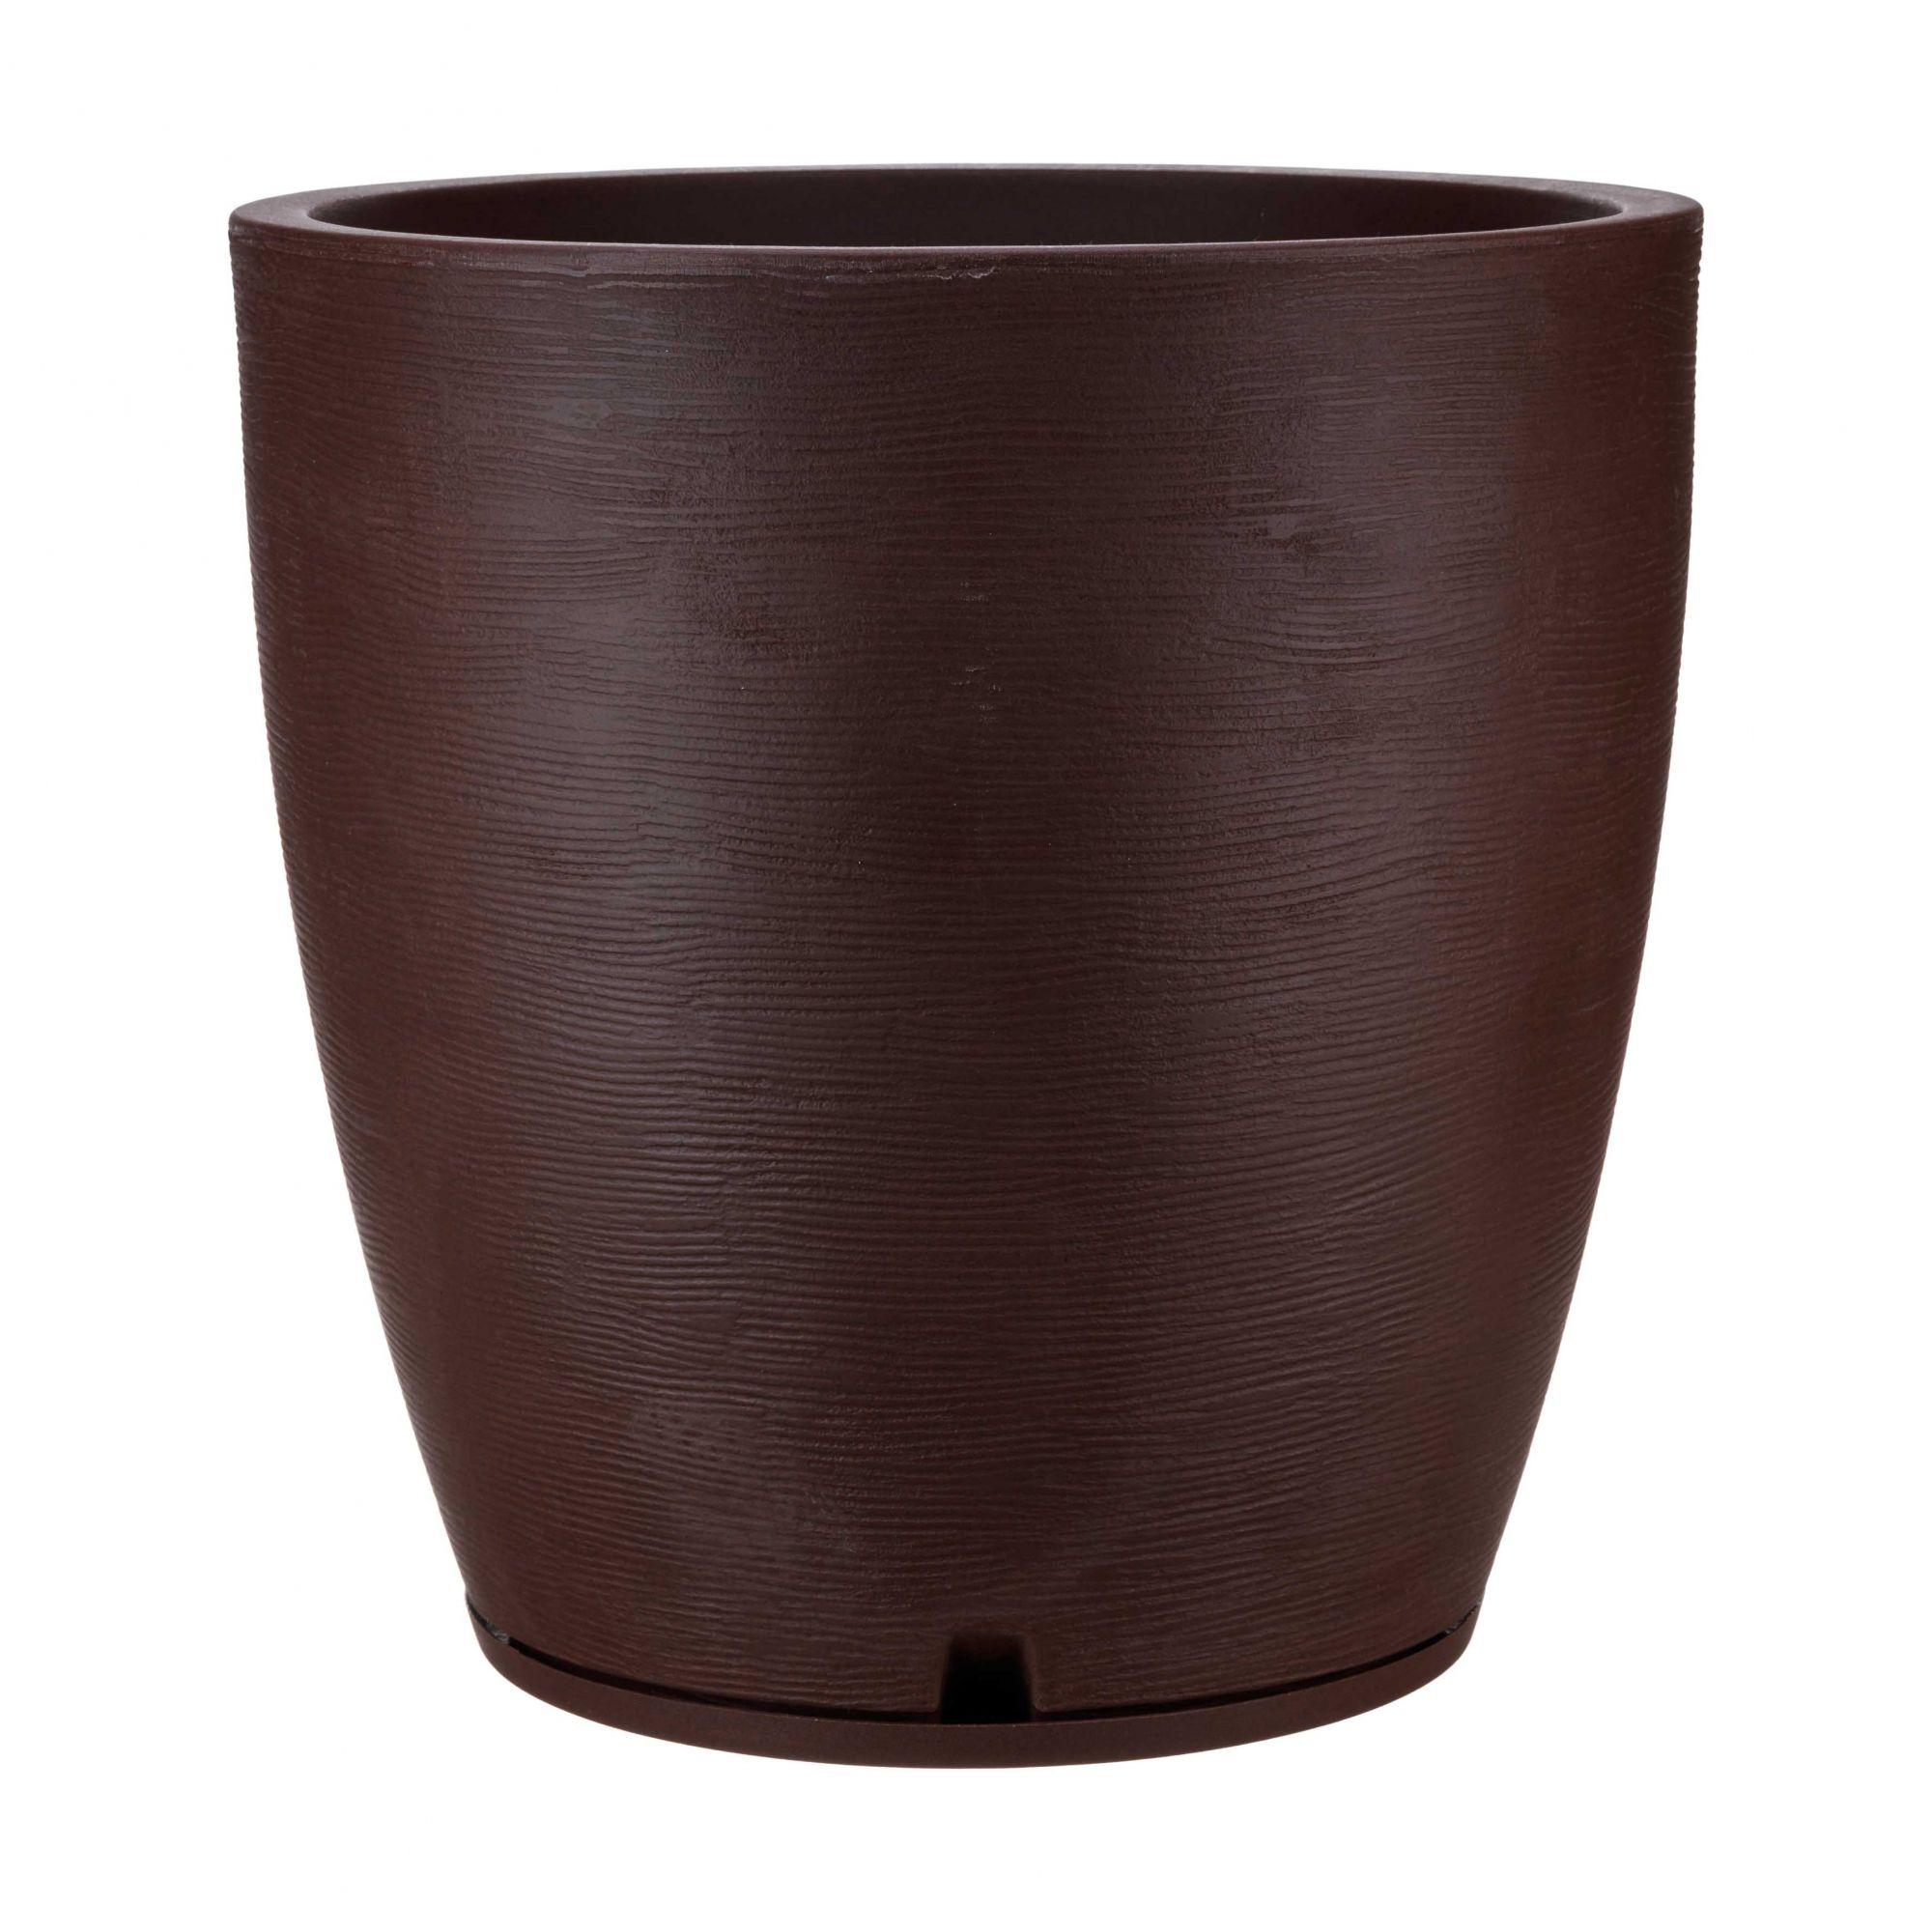 Vaso Amsterdã Grafiato Marron Stone - 49 x 55 cm